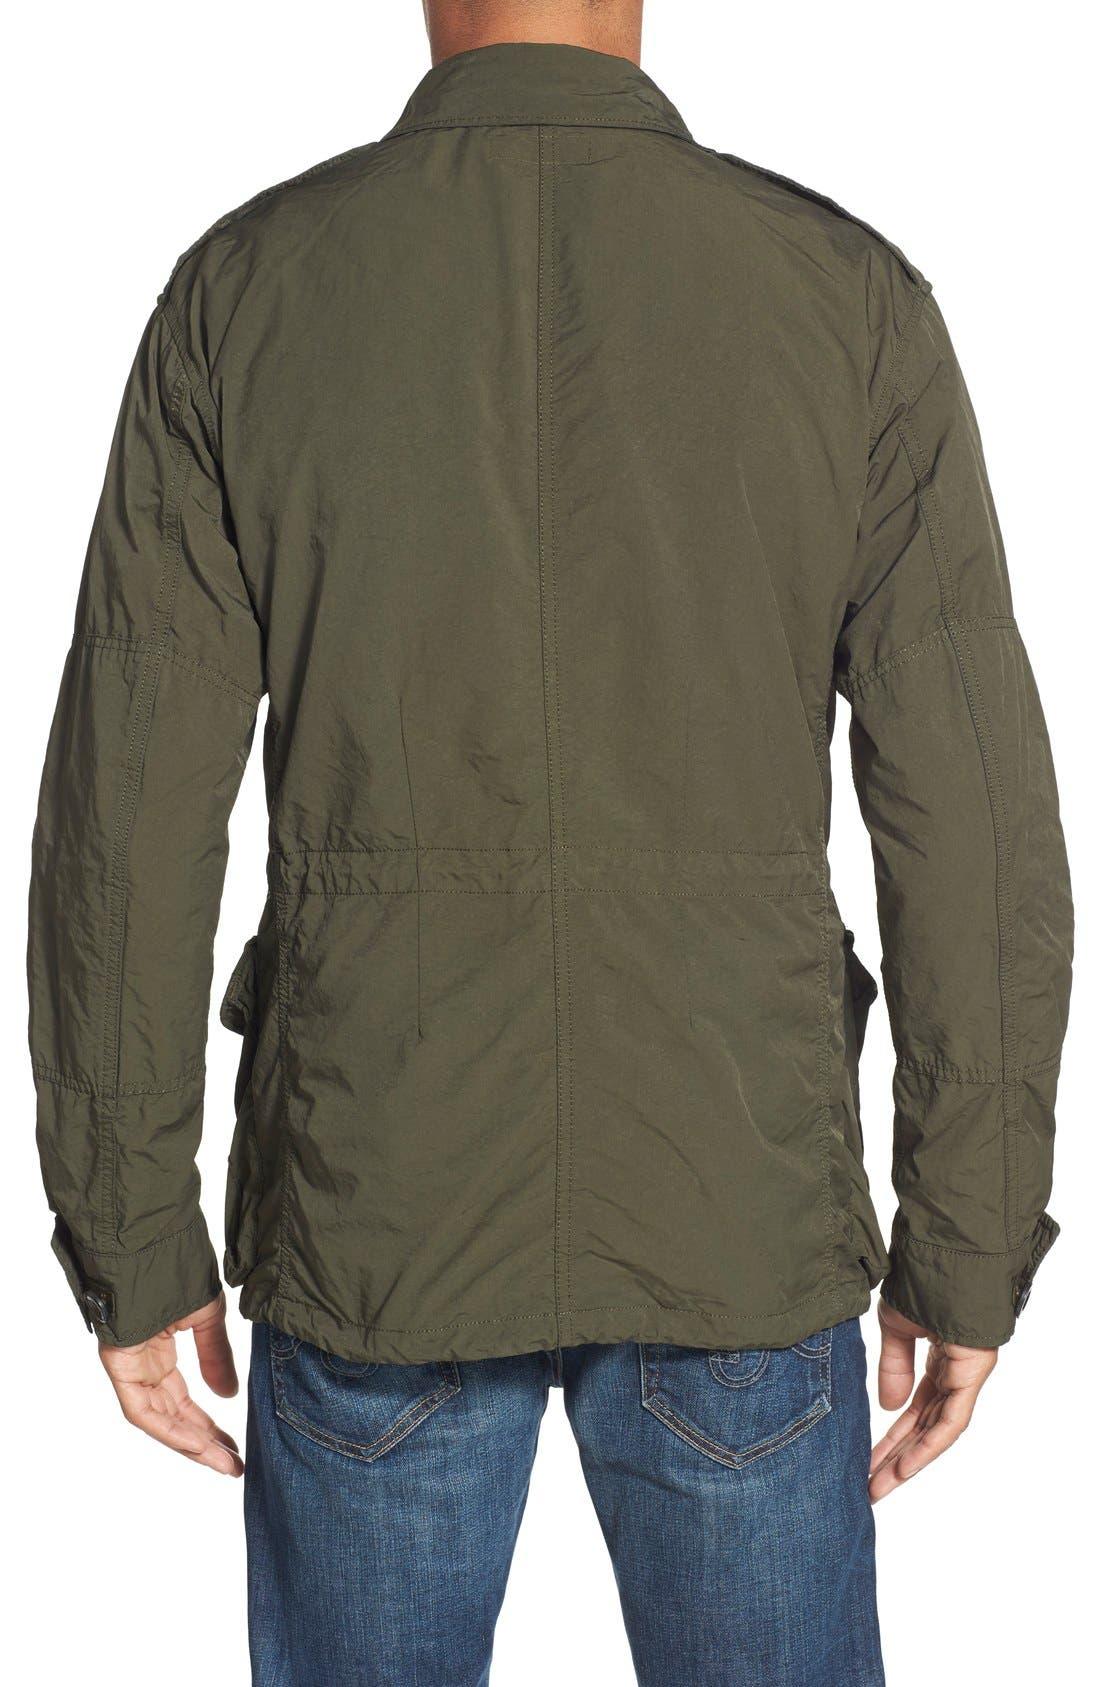 Twill Combat Military Jacket,                             Alternate thumbnail 5, color,                             300